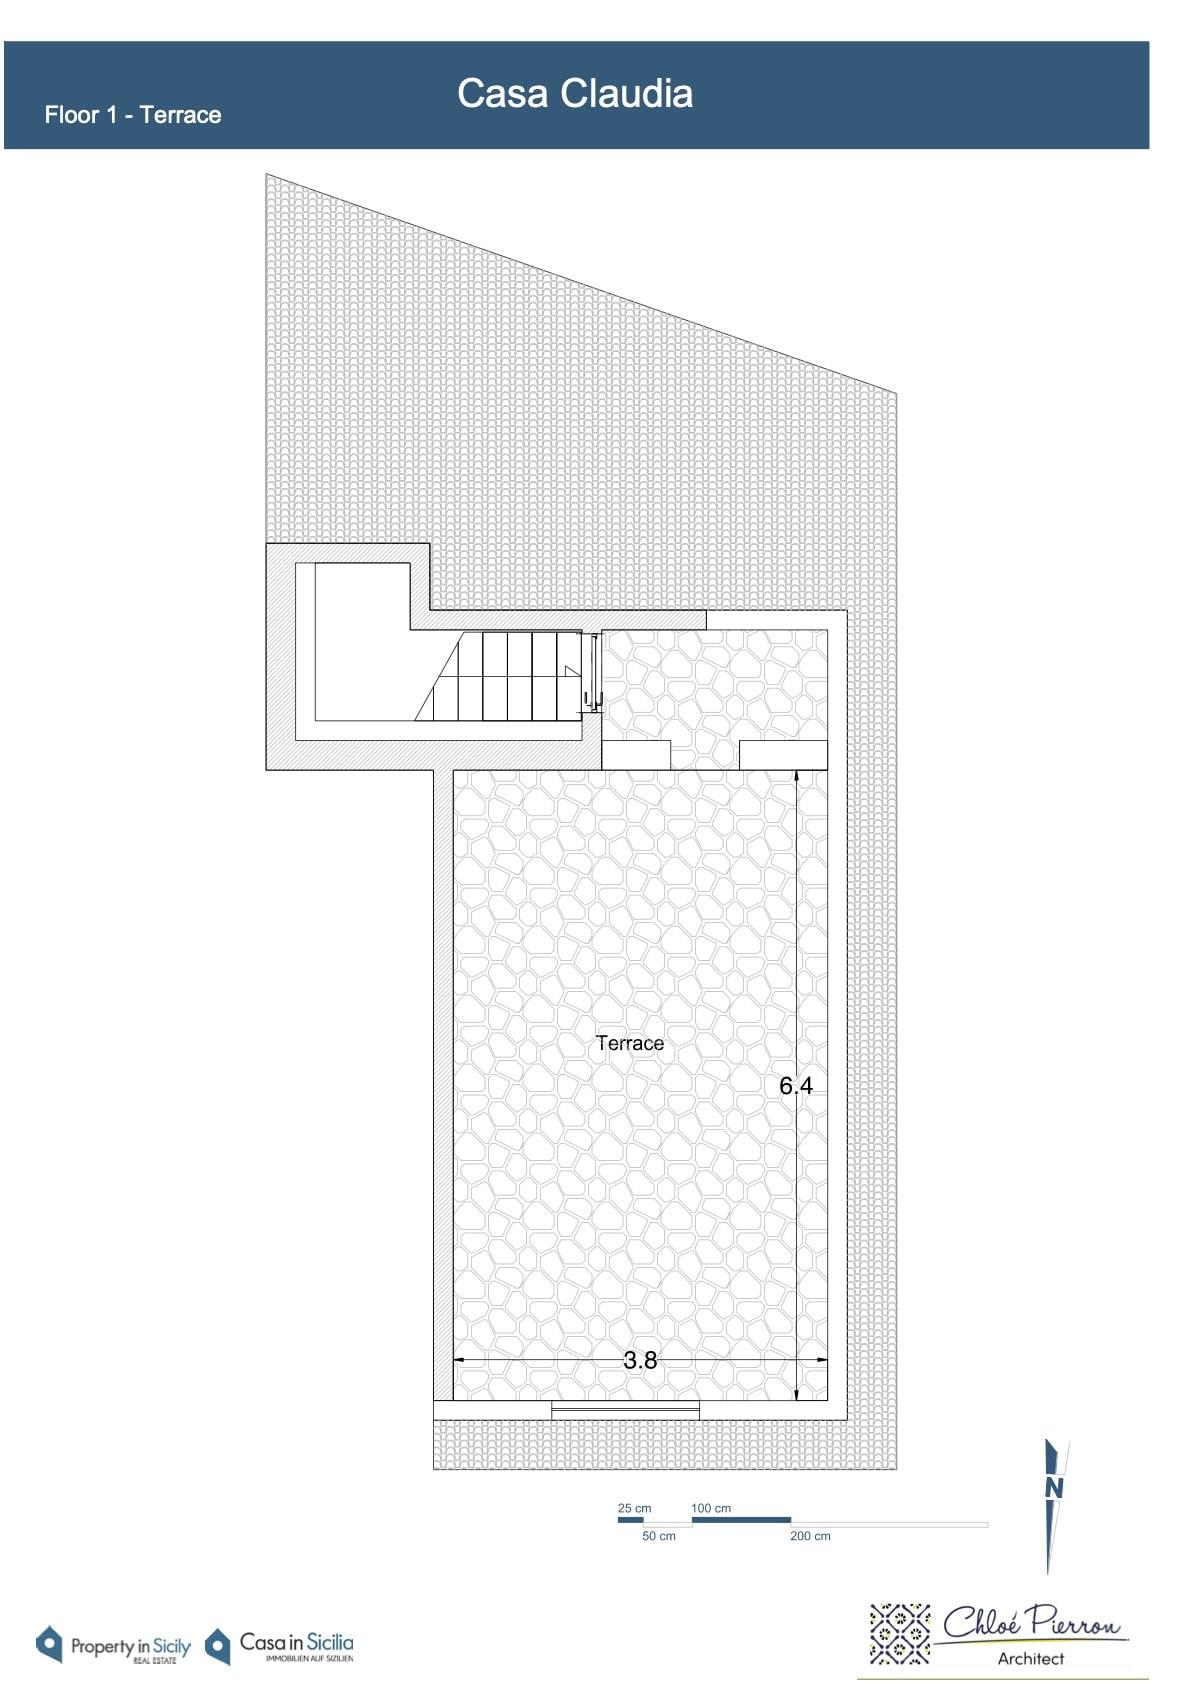 Ebene 1 - Terrasse